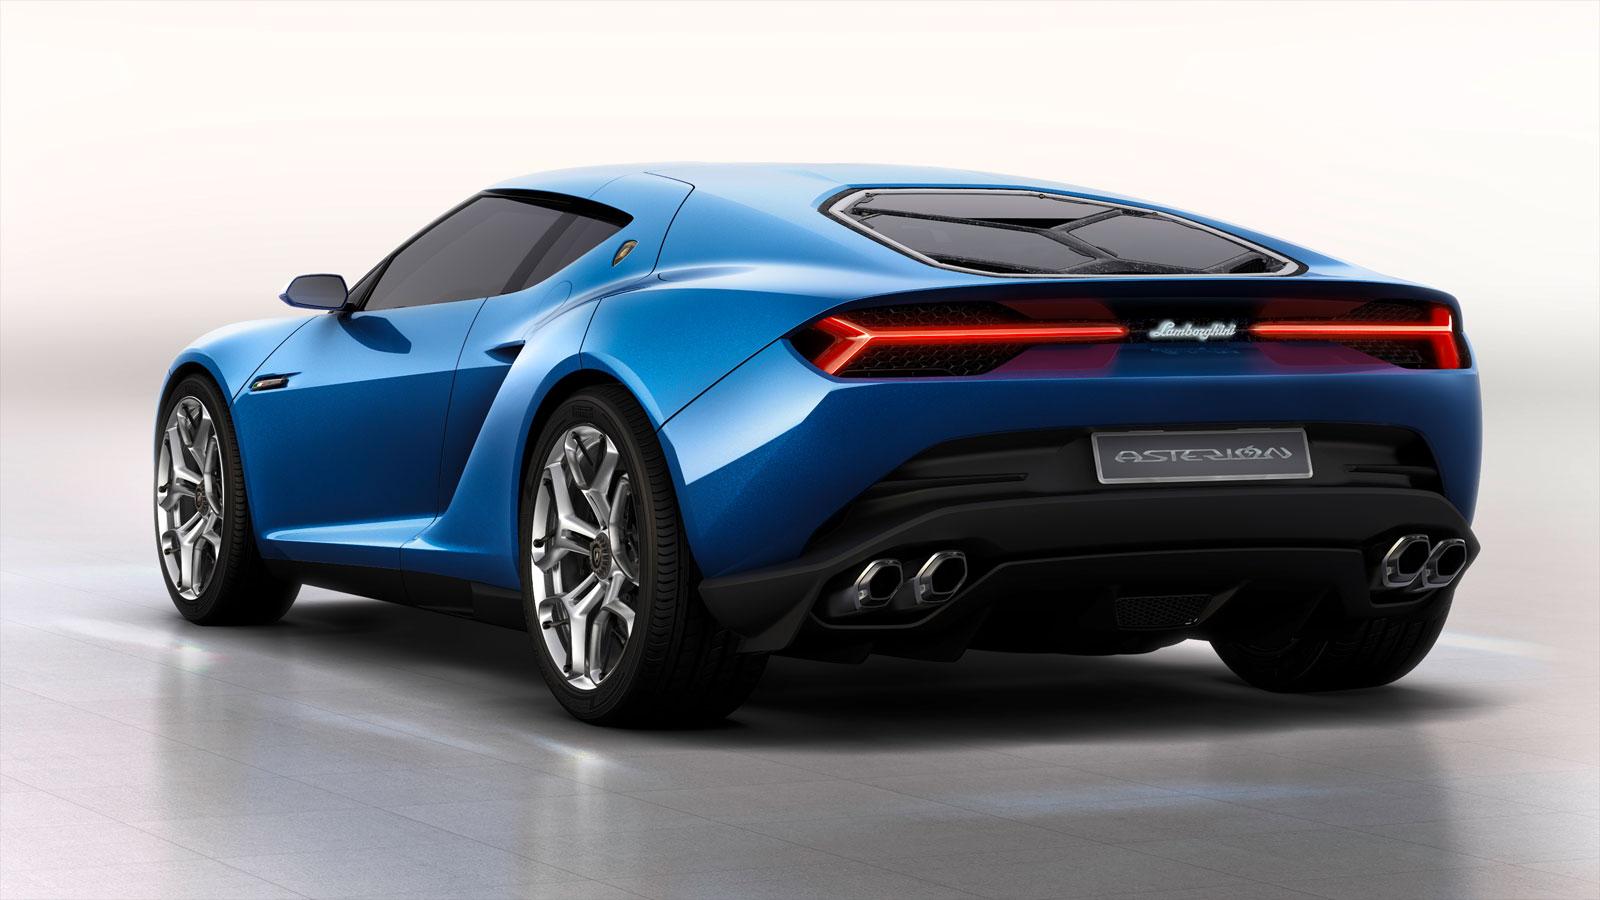 Lamborghini Asterion Lpi 910 4